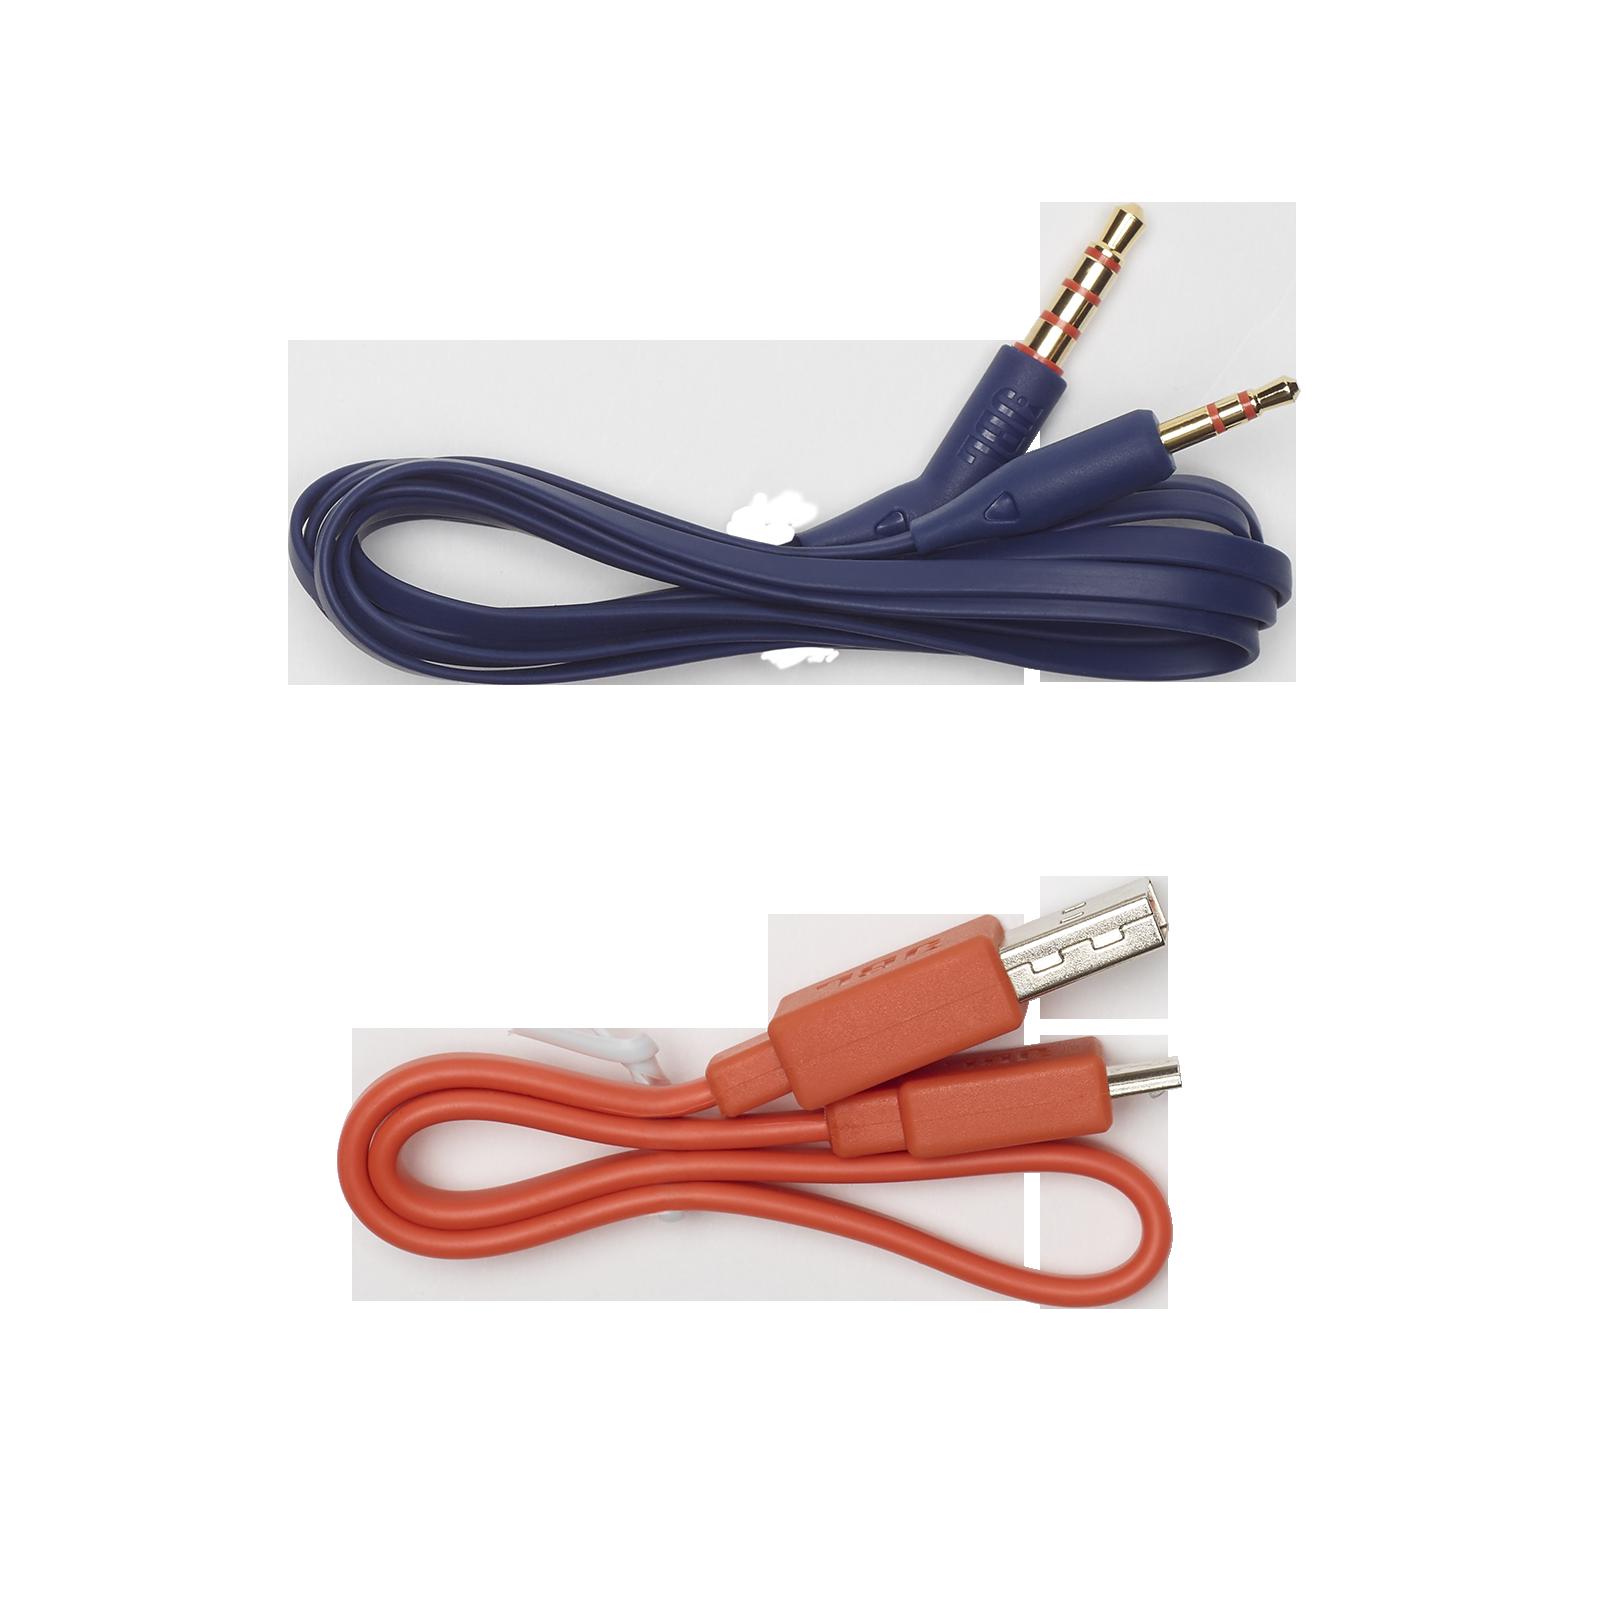 JBL TUNE 700BT - Blue - Wireless Over-Ear Headphones - Detailshot 7